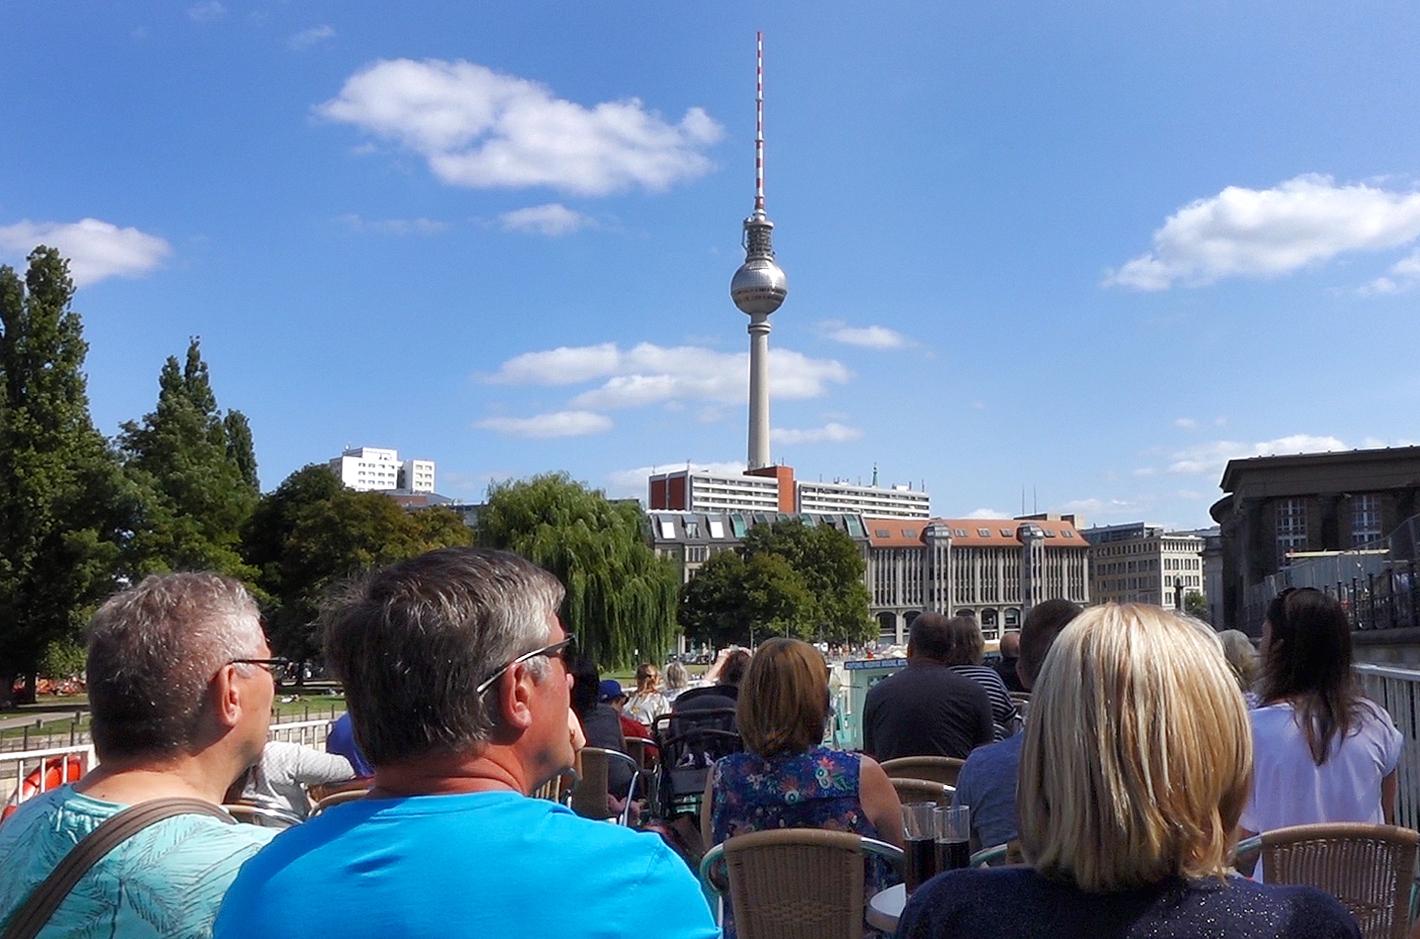 anlegestelle-holsteiner-ufer-berliner-fernsehturm